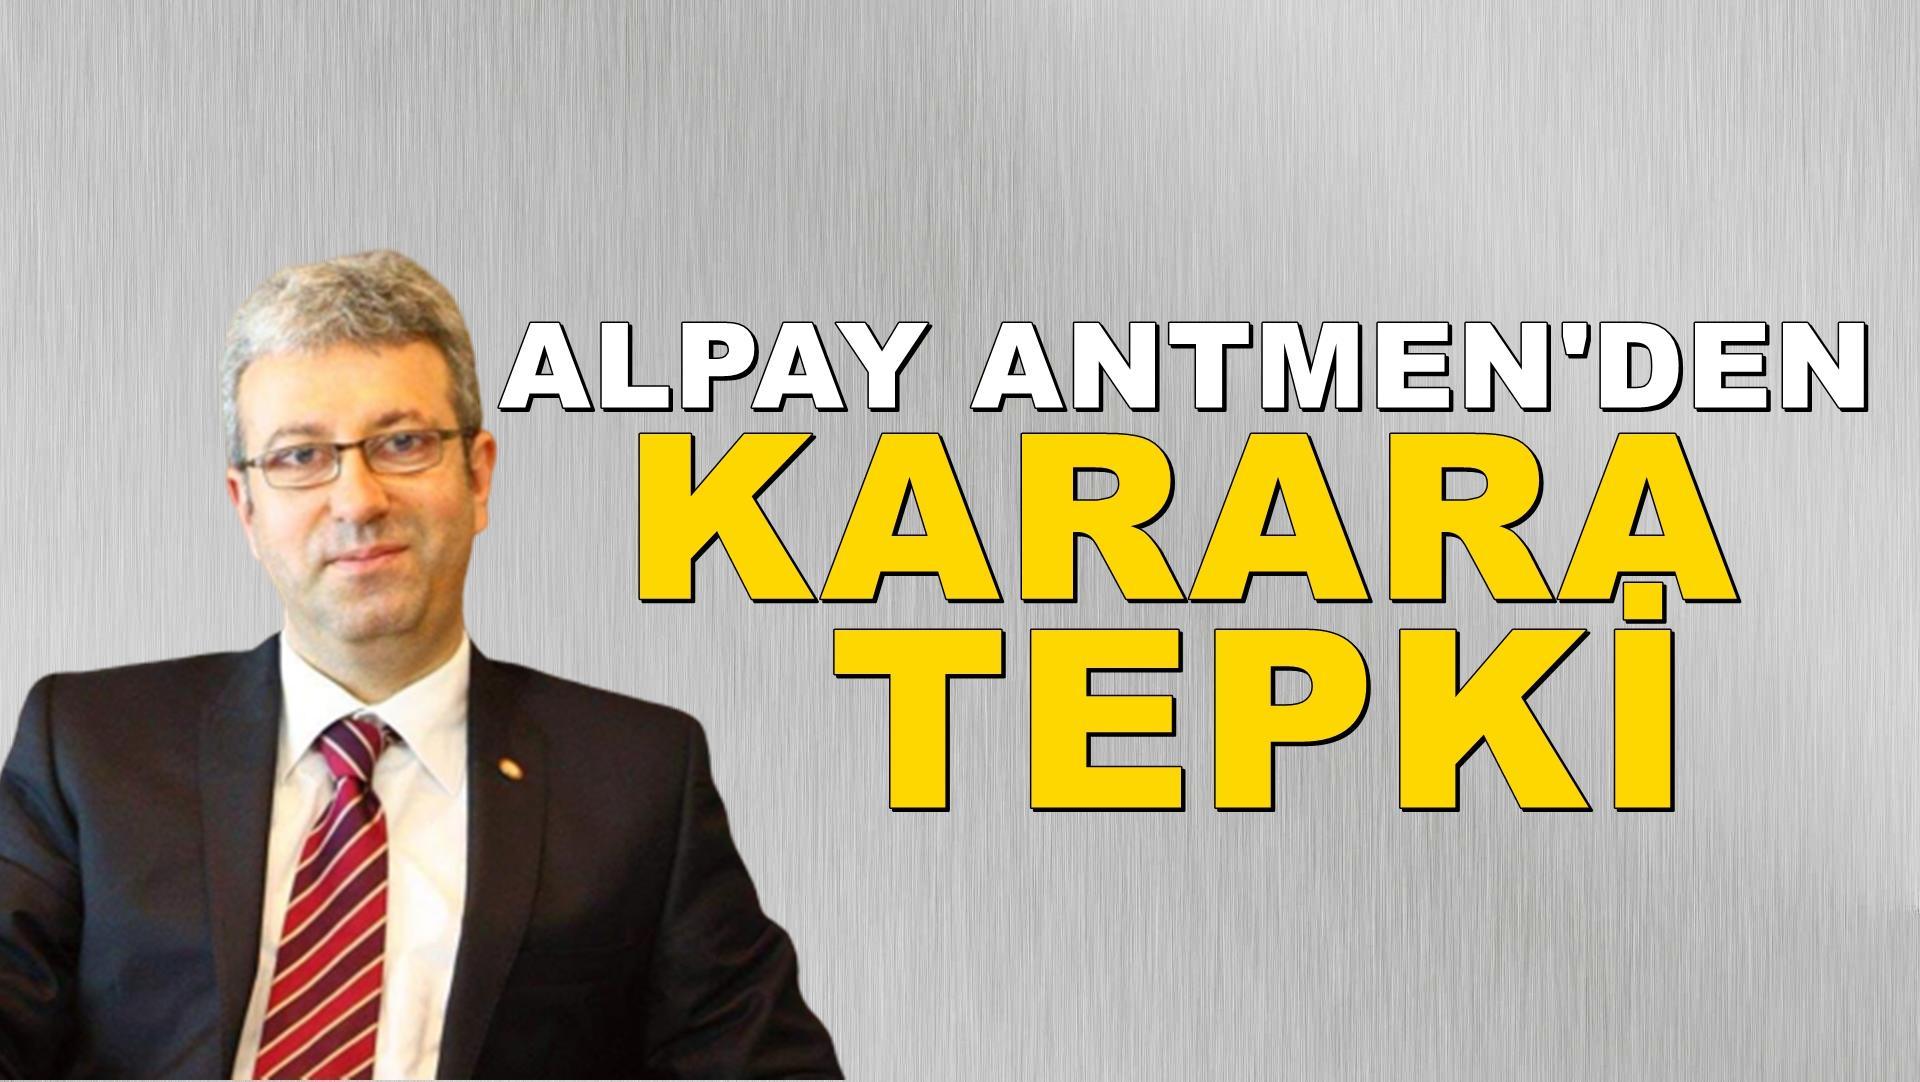 Alpay Antmen'den tepki!